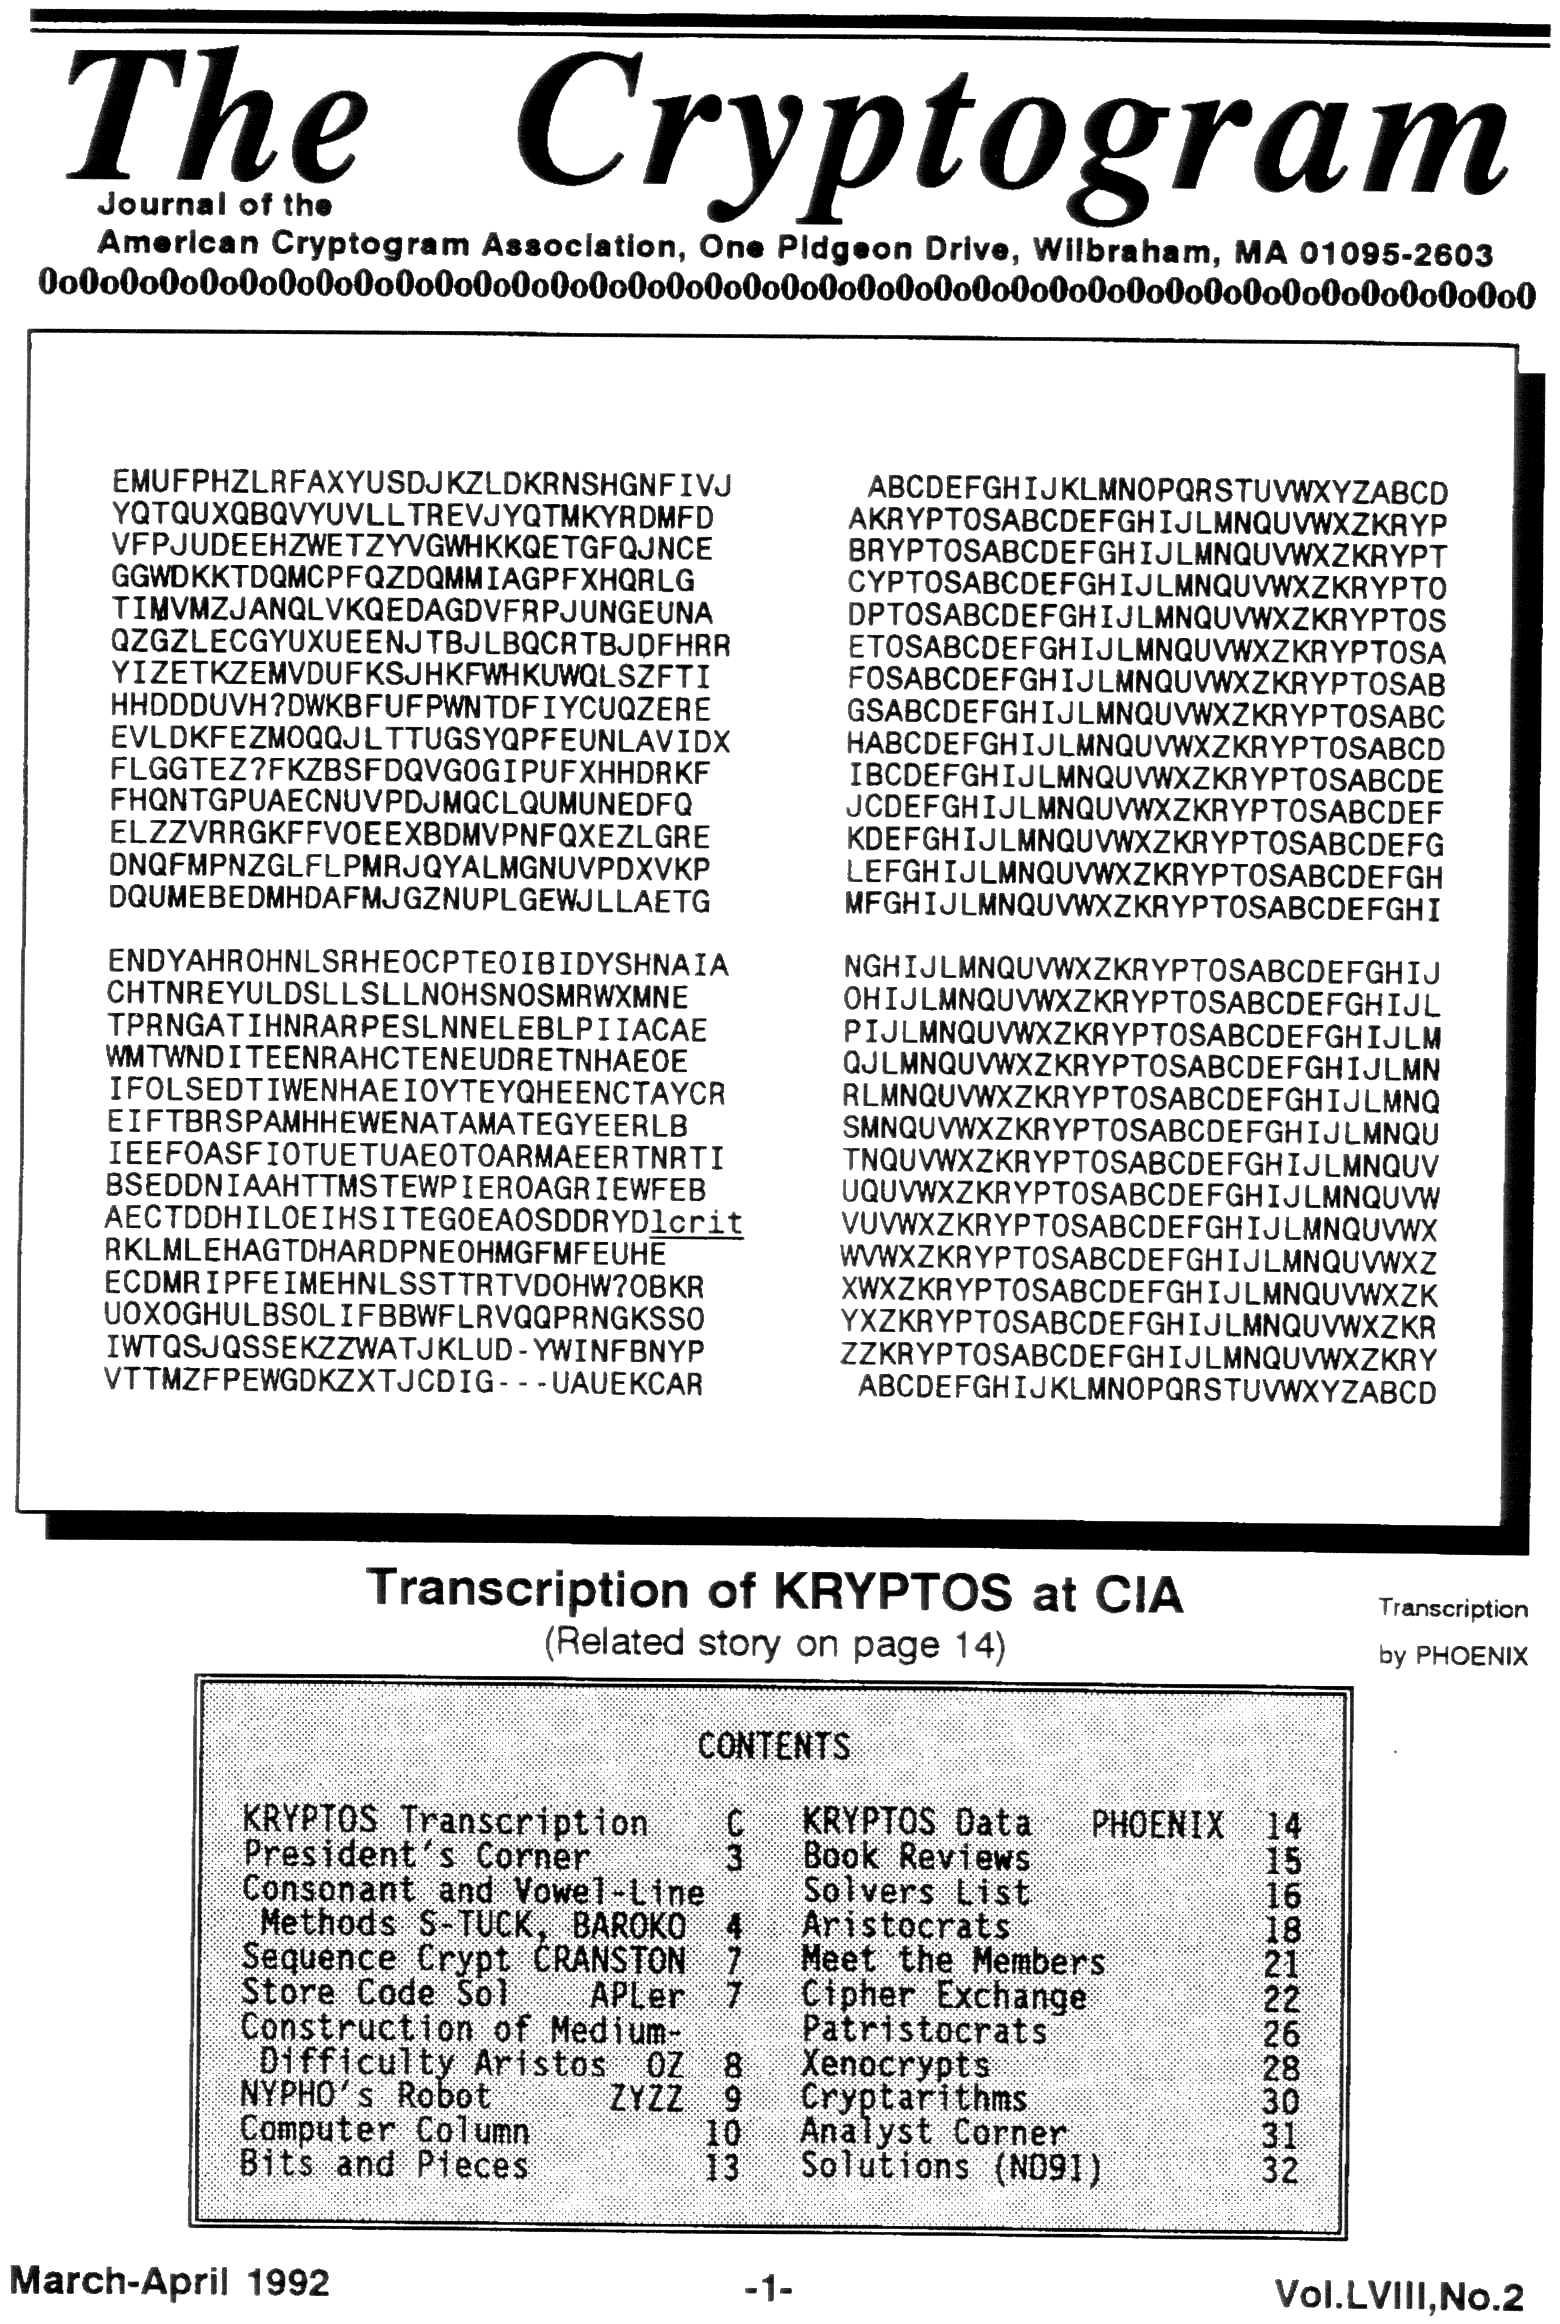 Kryptos Images - American Cryptogram Association